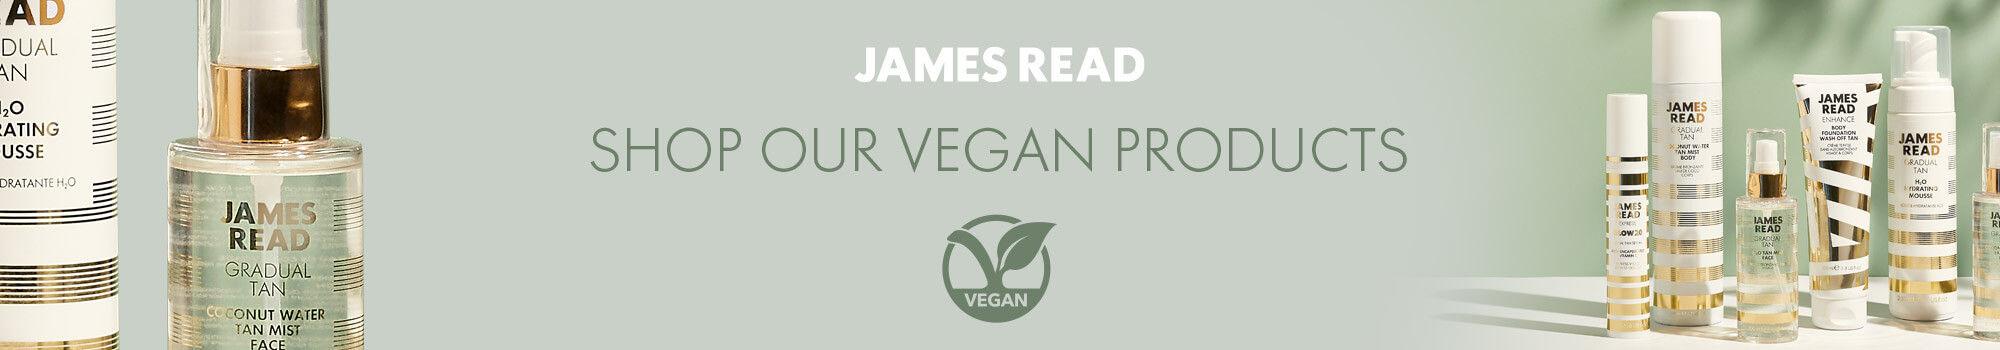 James Read Vegan Shop Header